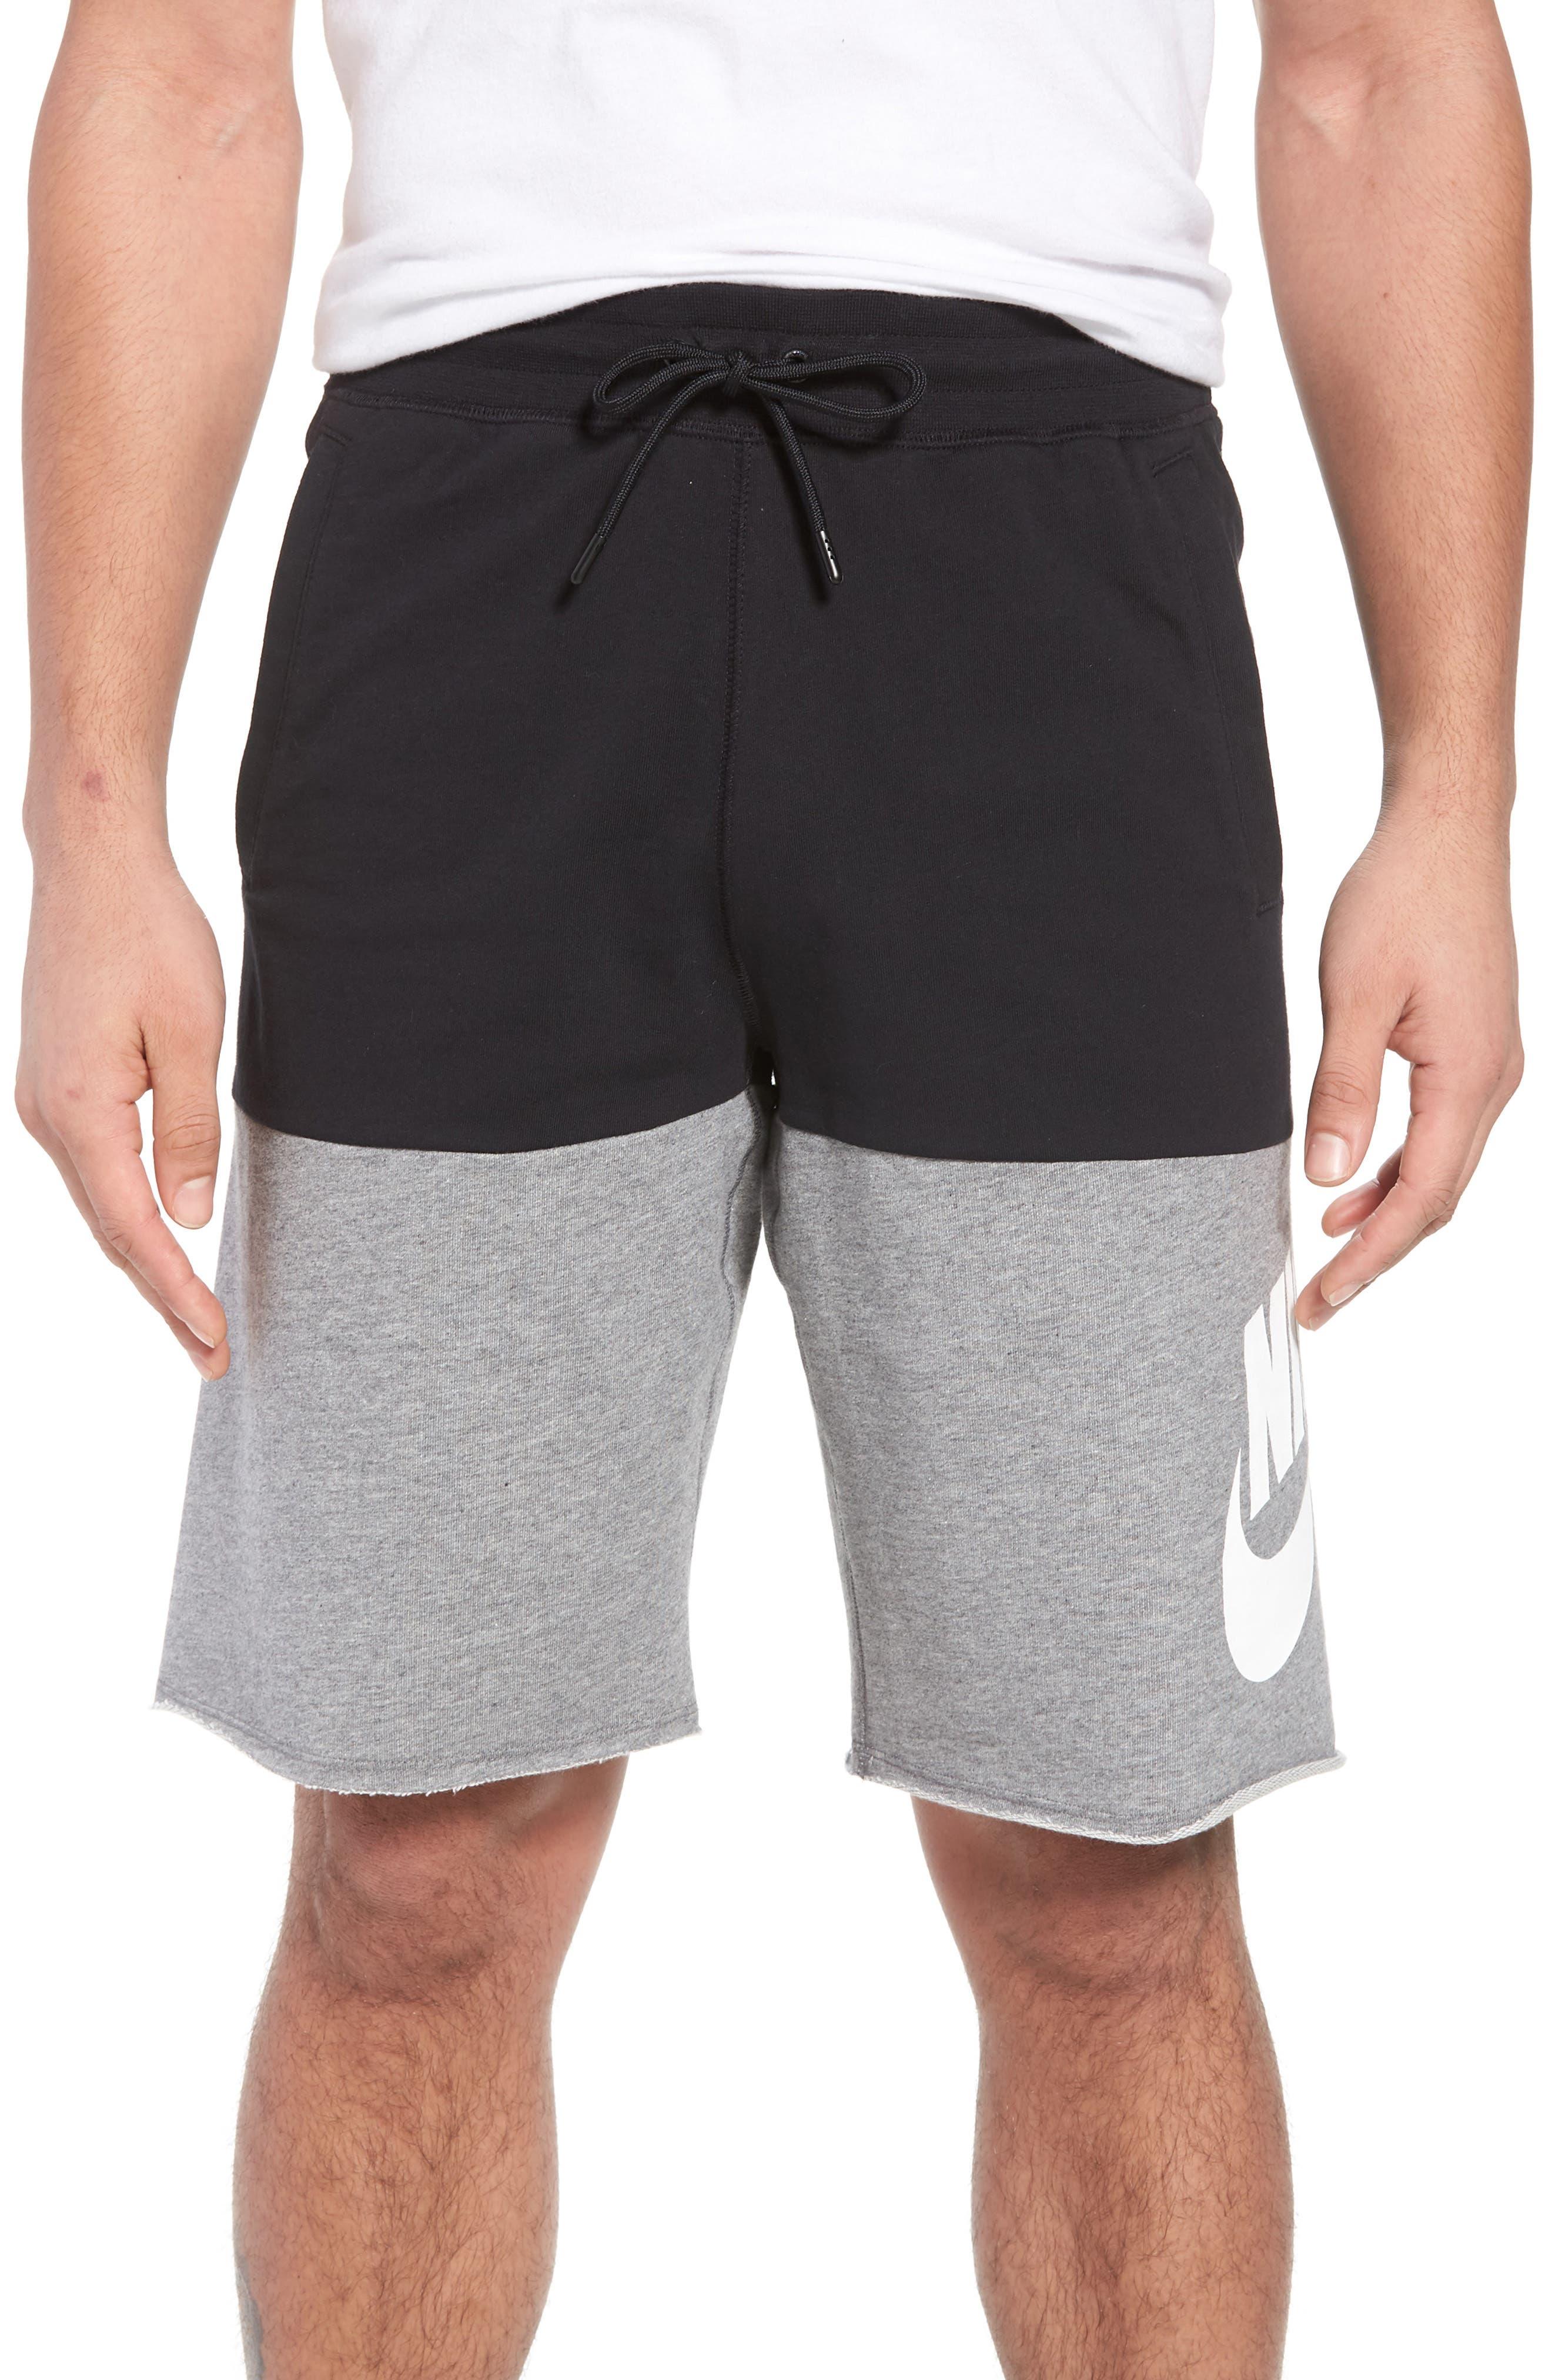 NSW Franchise GX3 Shorts,                             Main thumbnail 1, color,                             Black/ Carbon Heather/ White